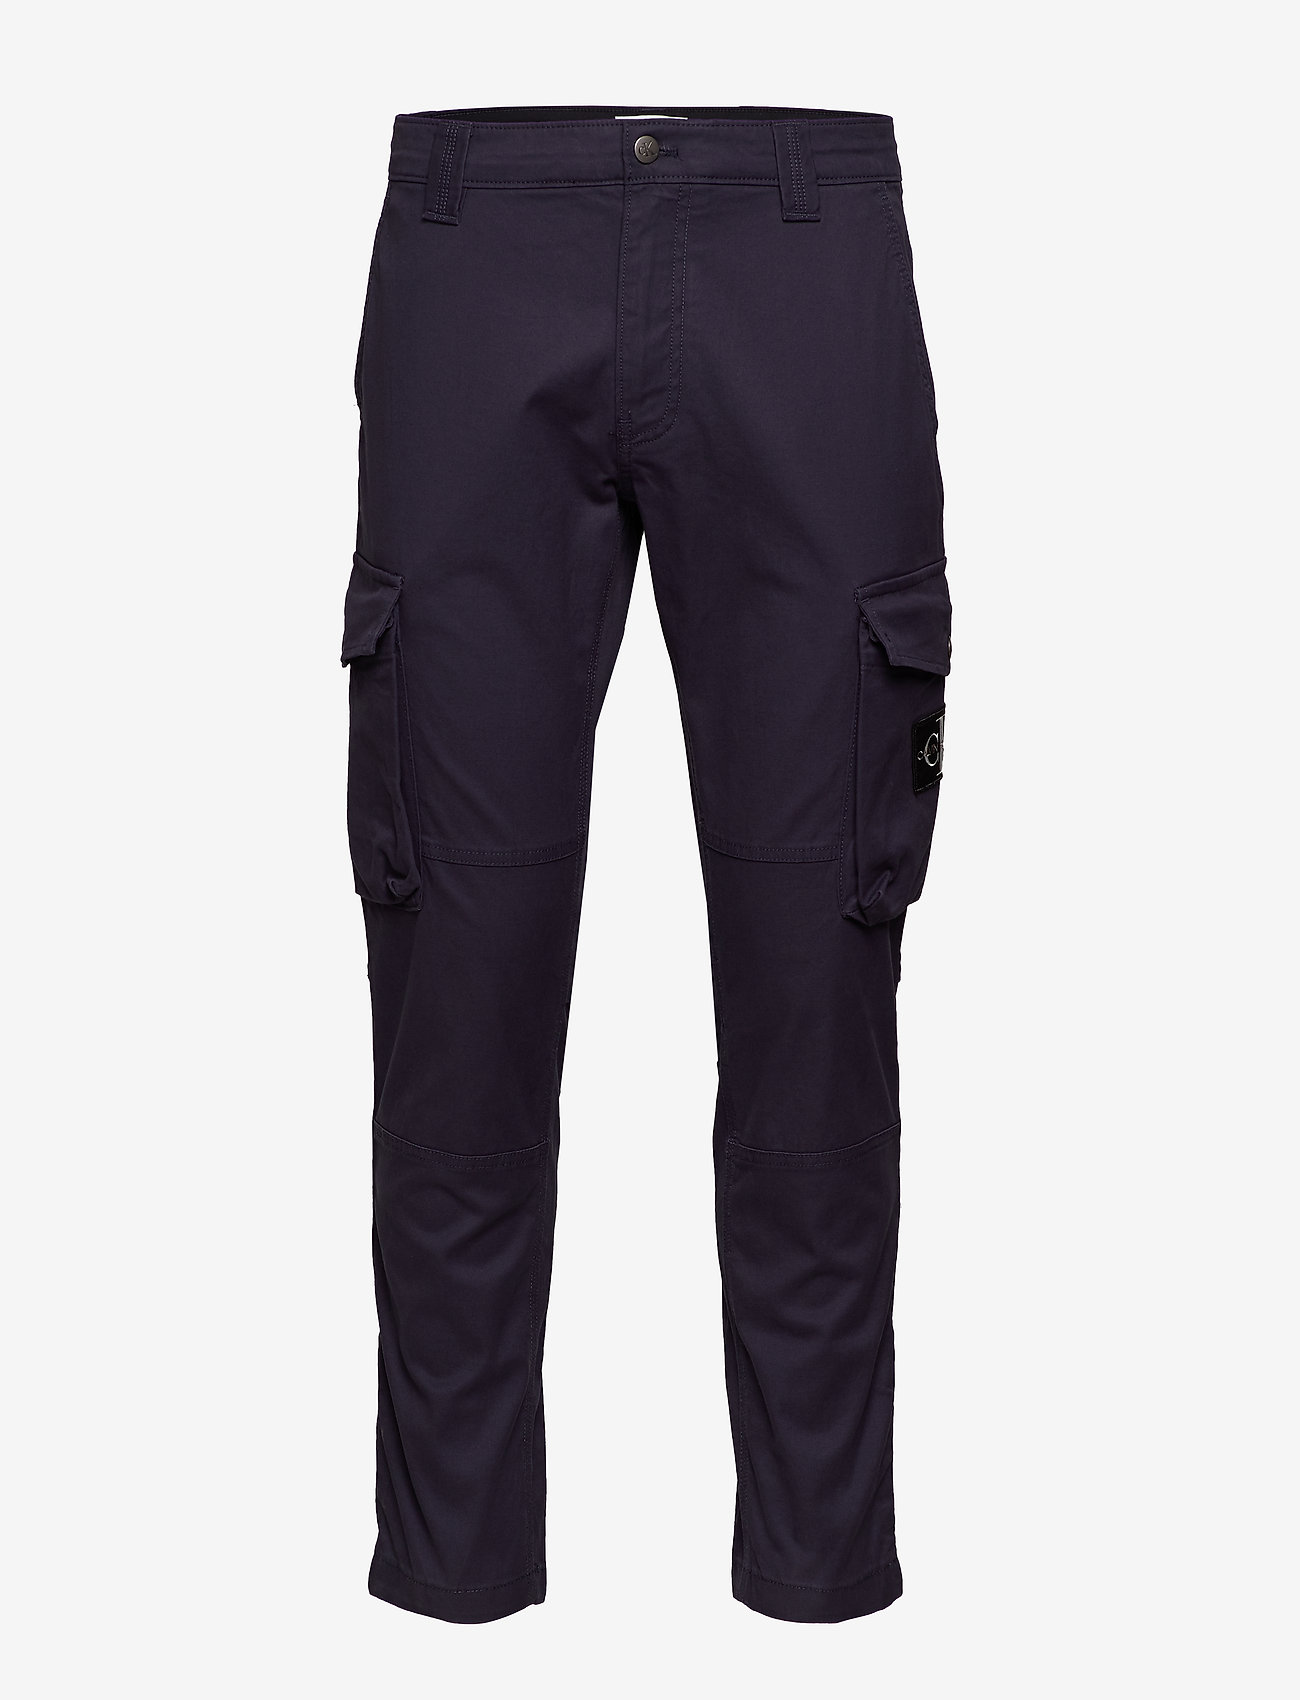 Calvin Klein Jeans - SKINNY WASHED CARGO PANT - cargo housut - night sky - 0